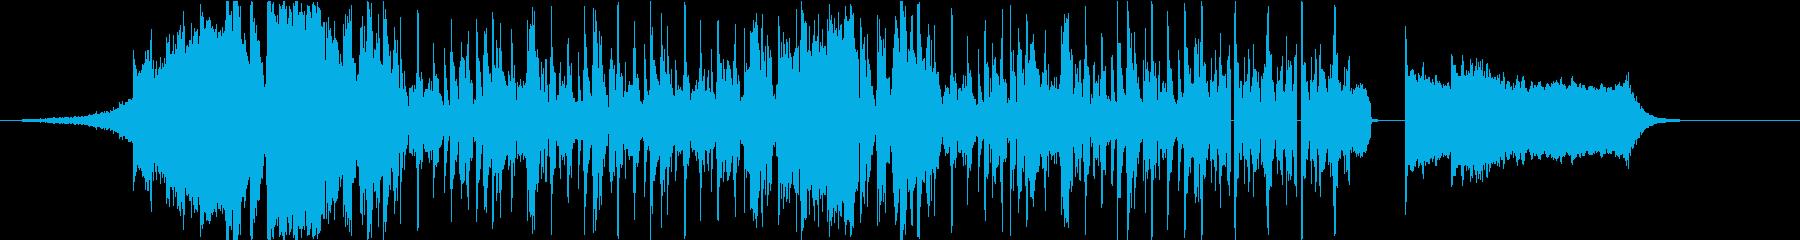 HipHop8小節(DJプレイ風)の再生済みの波形